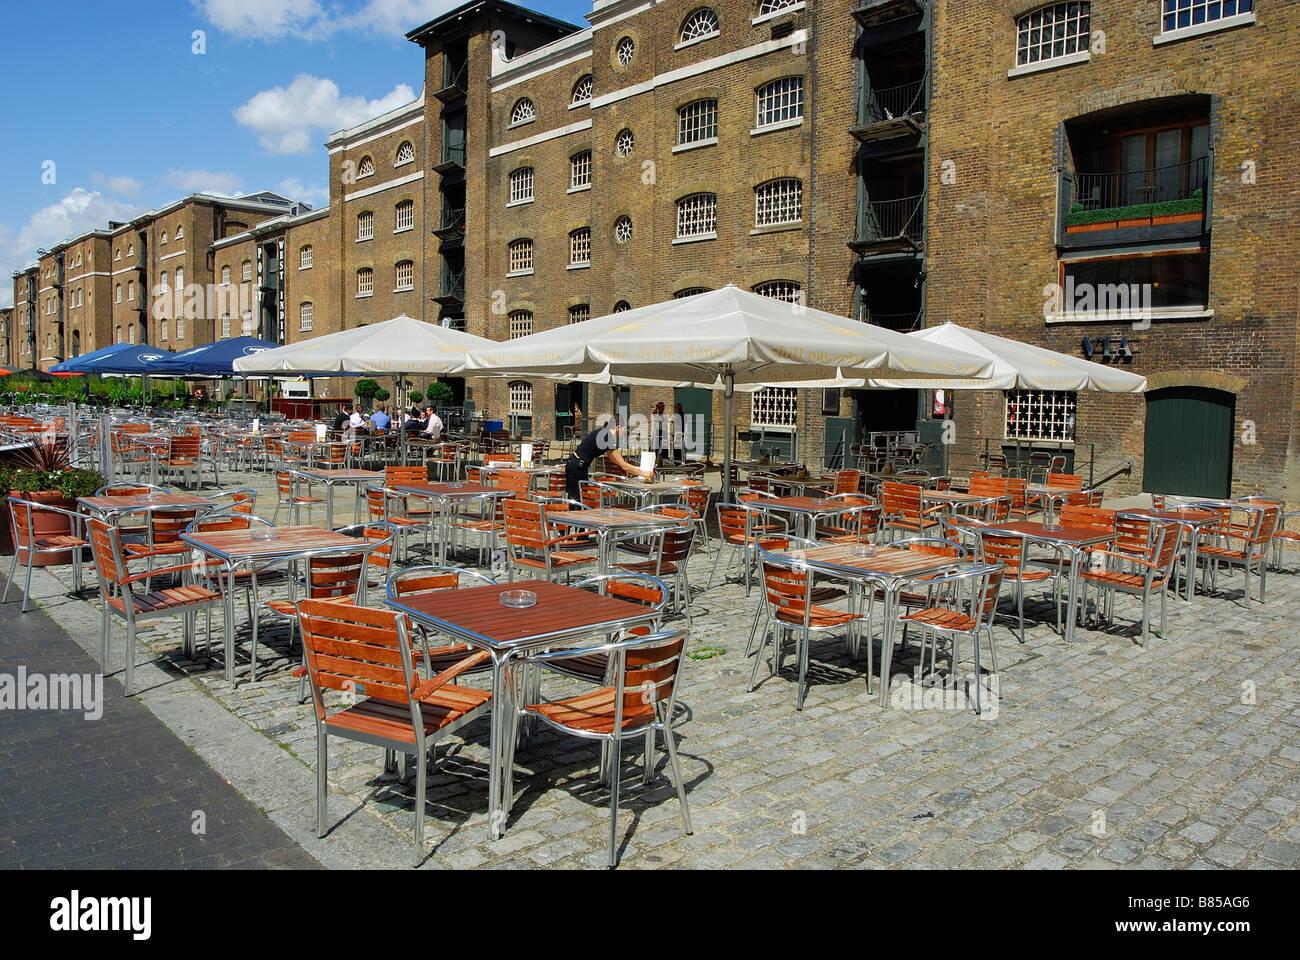 West India Quay Docklands London UK - Stock Image